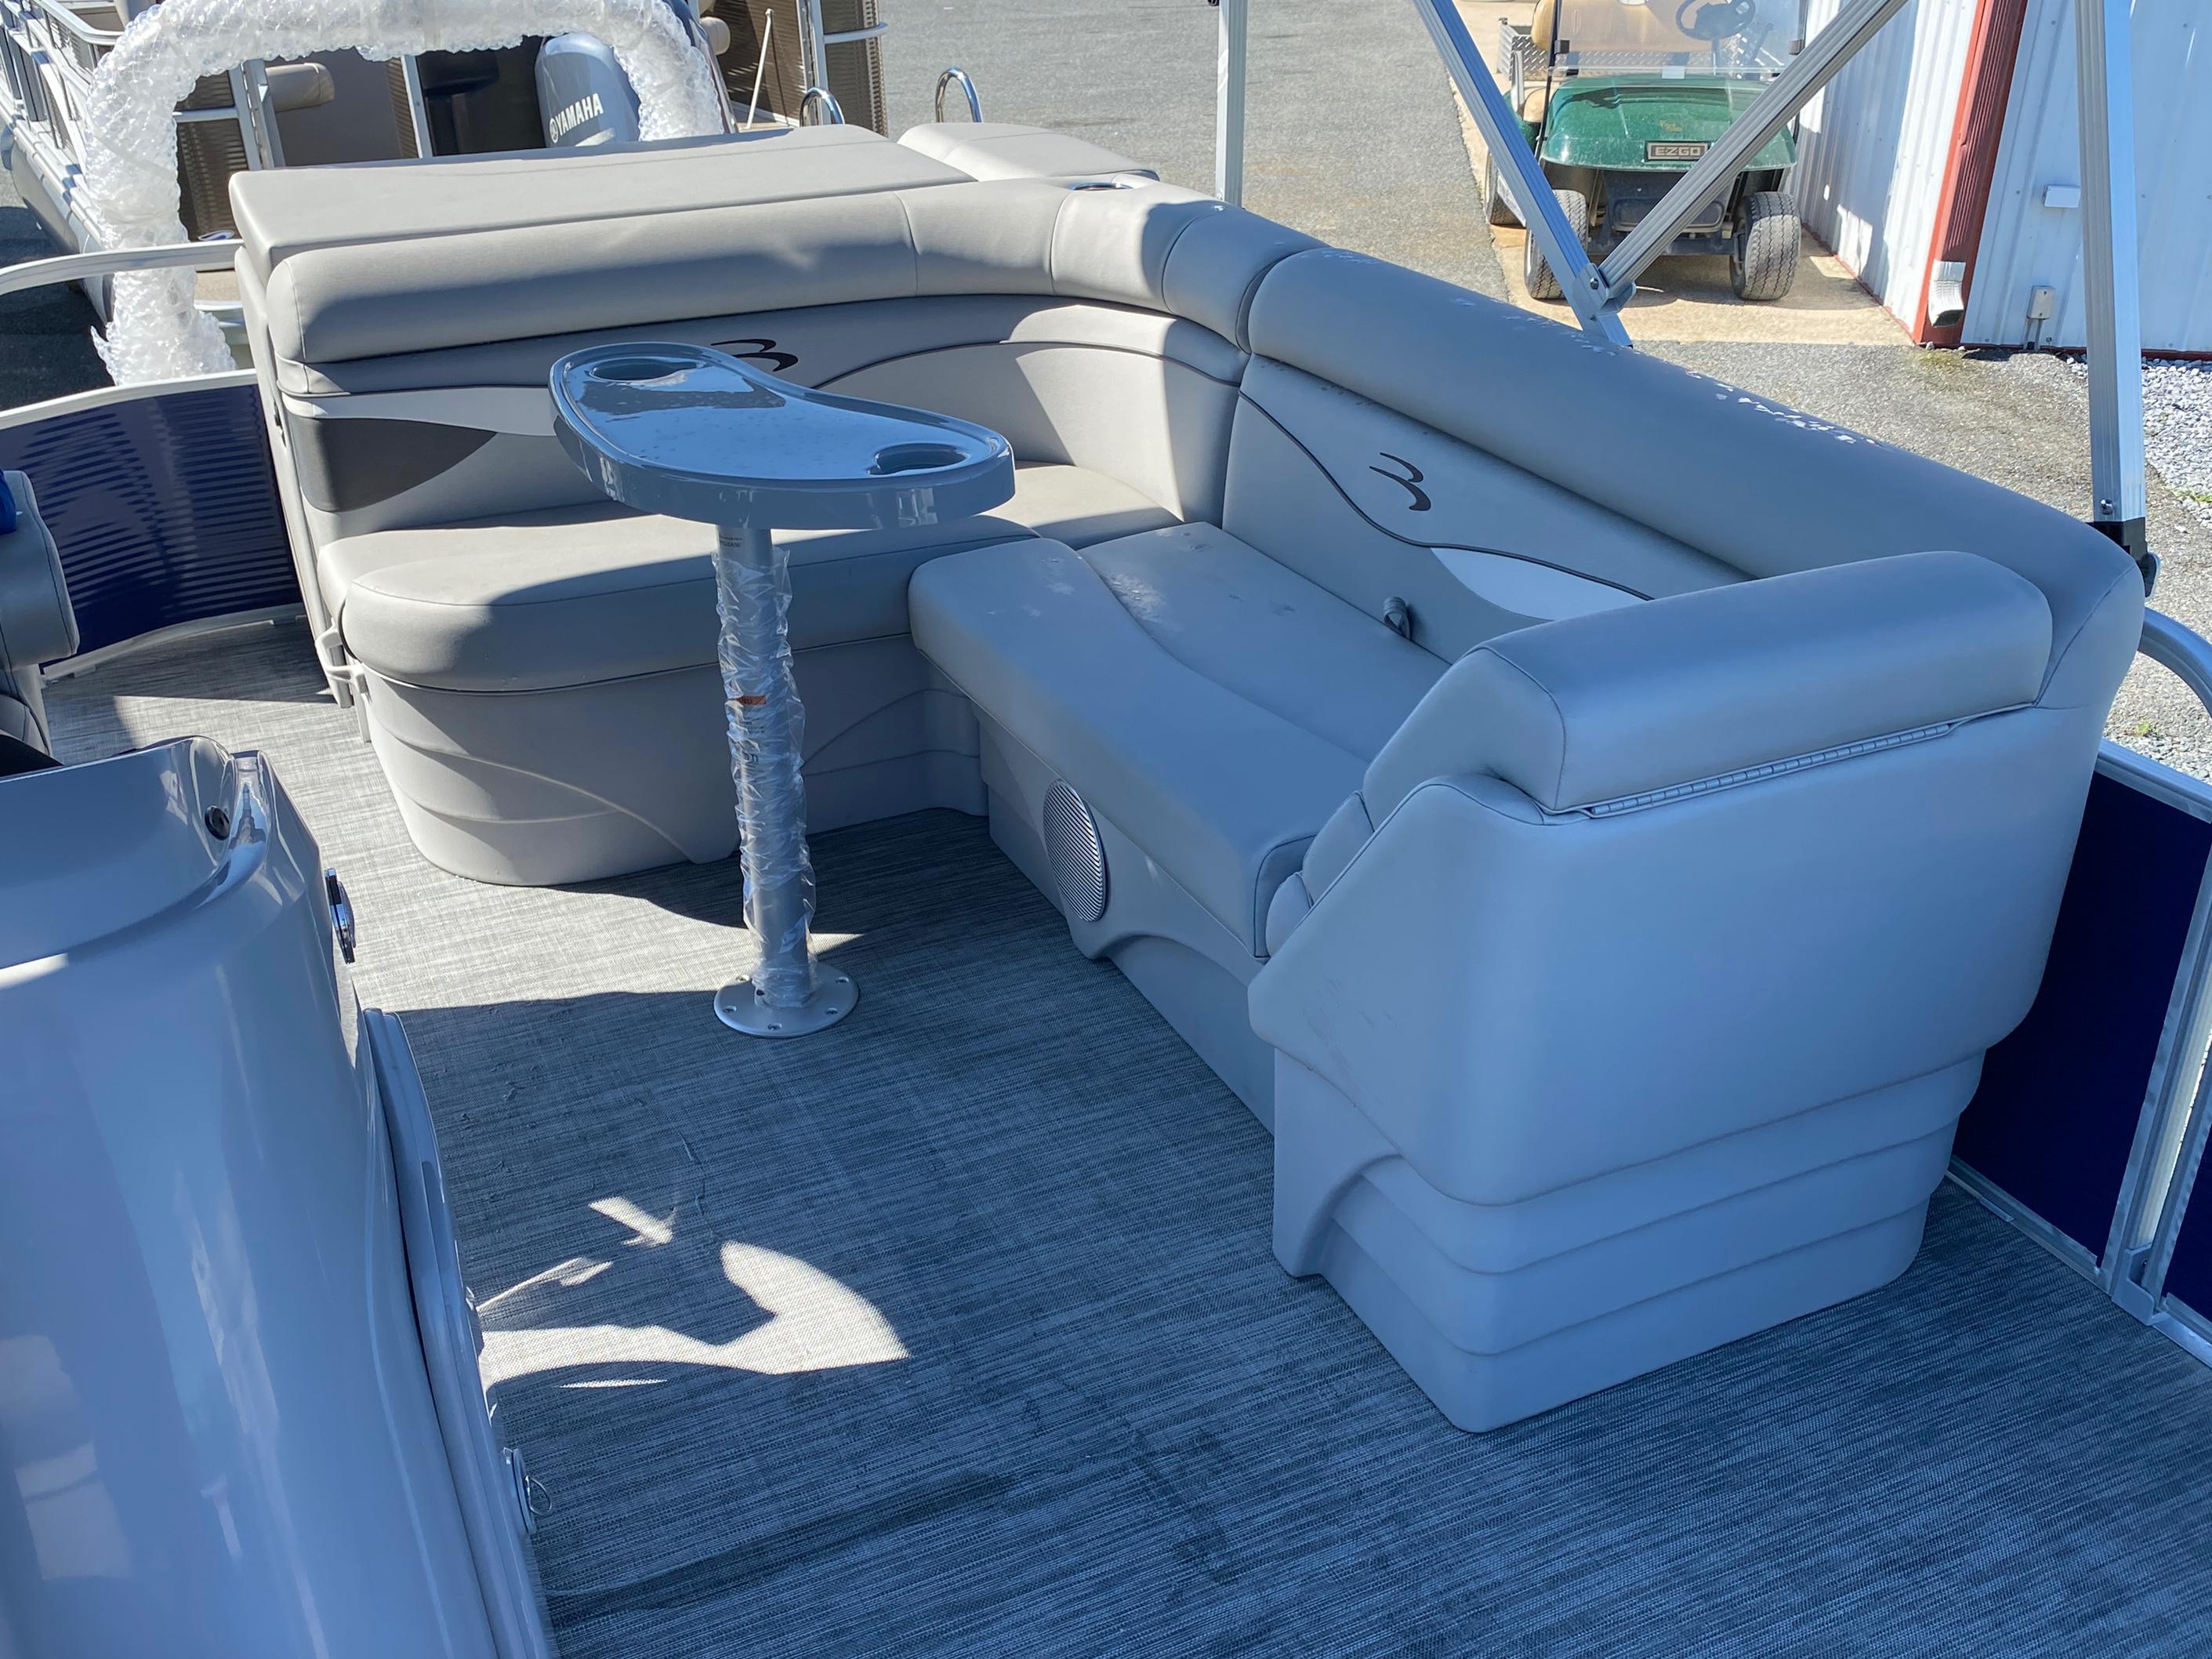 2021 Bennington boat for sale, model of the boat is 20 SVL & Image # 9 of 9